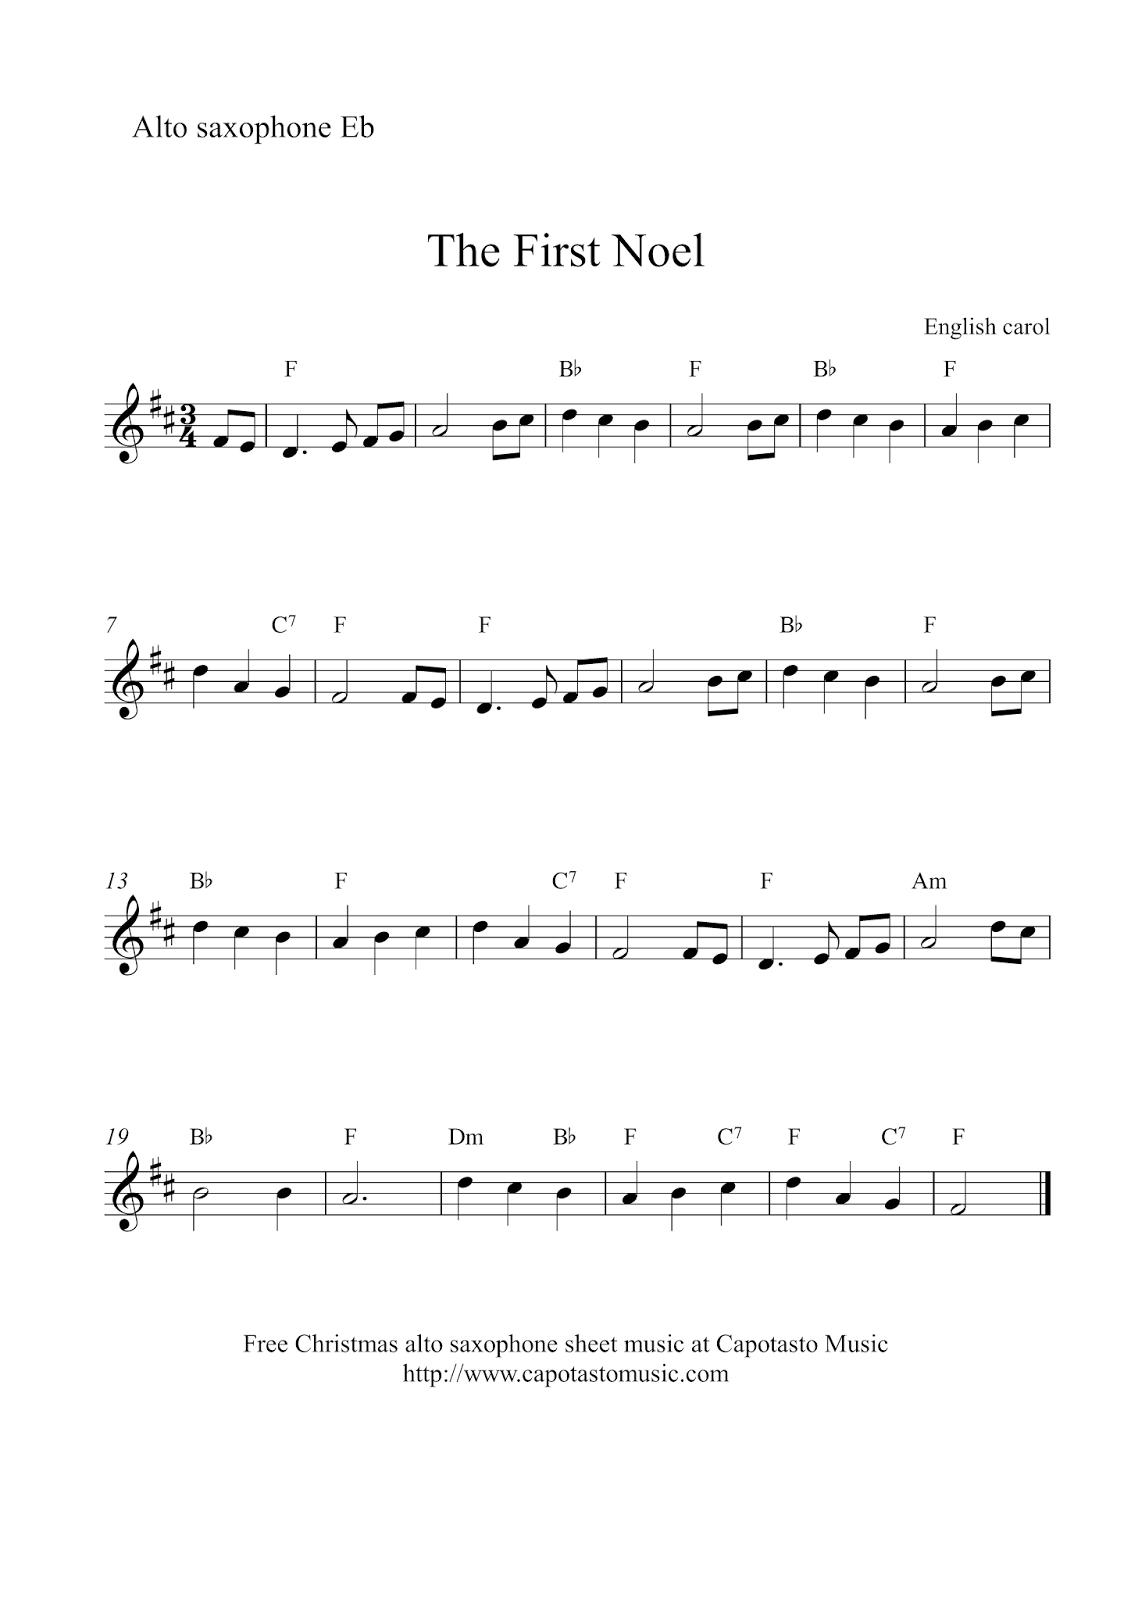 Free Sheet Music Scores: Alto Saxophone Christmas | Xmas Music - Free Printable Alto Saxophone Sheet Music